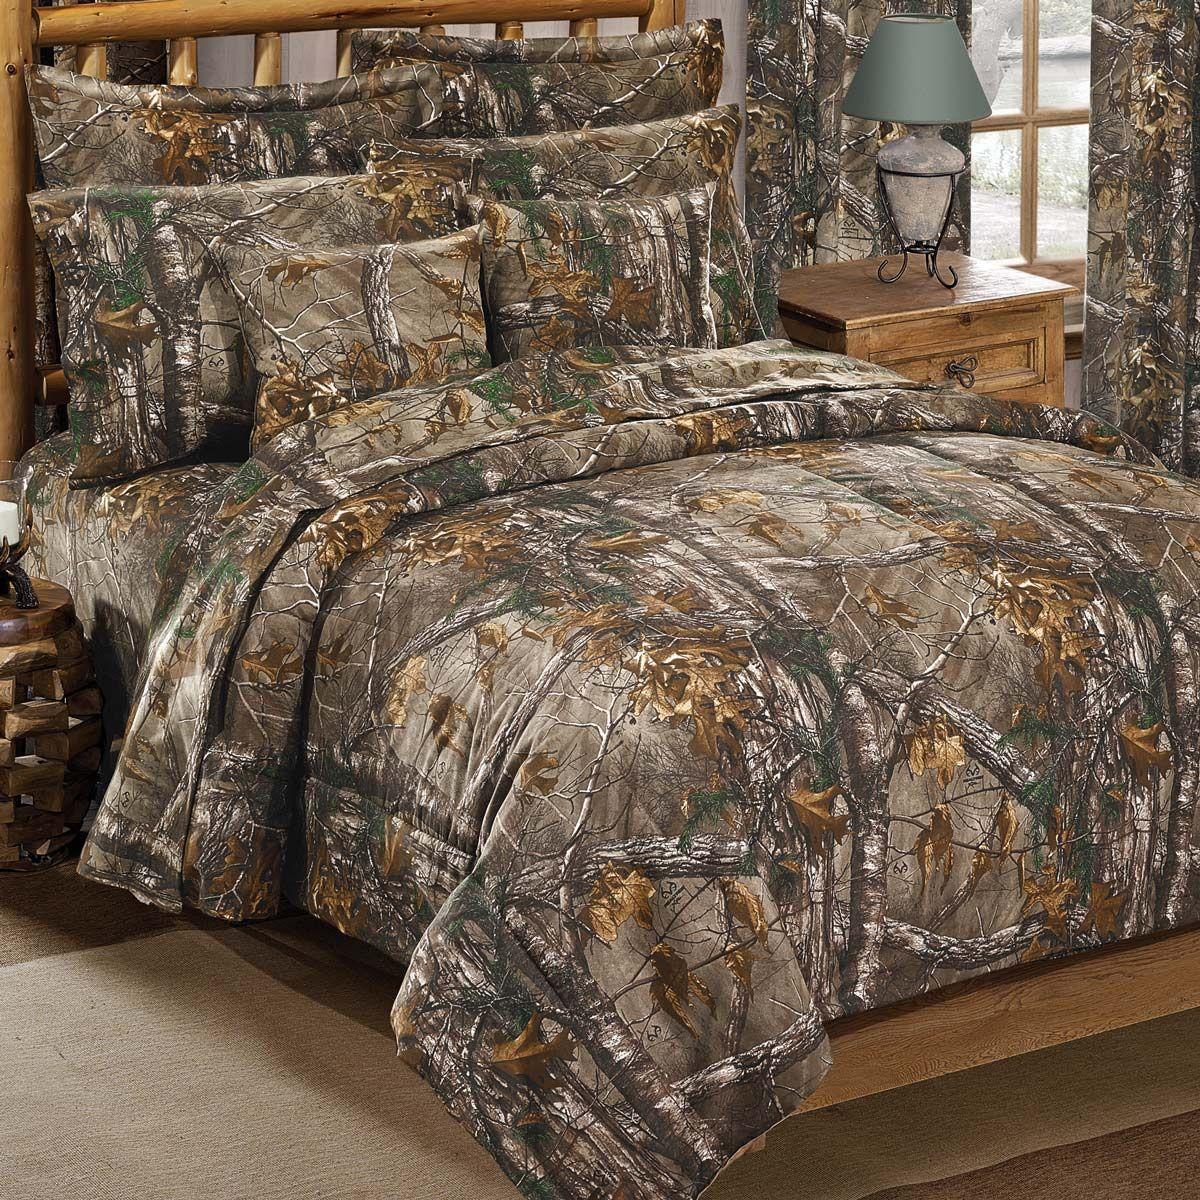 Realtree Camo Comforter Sets Queen Size Xtra Realtree Camo